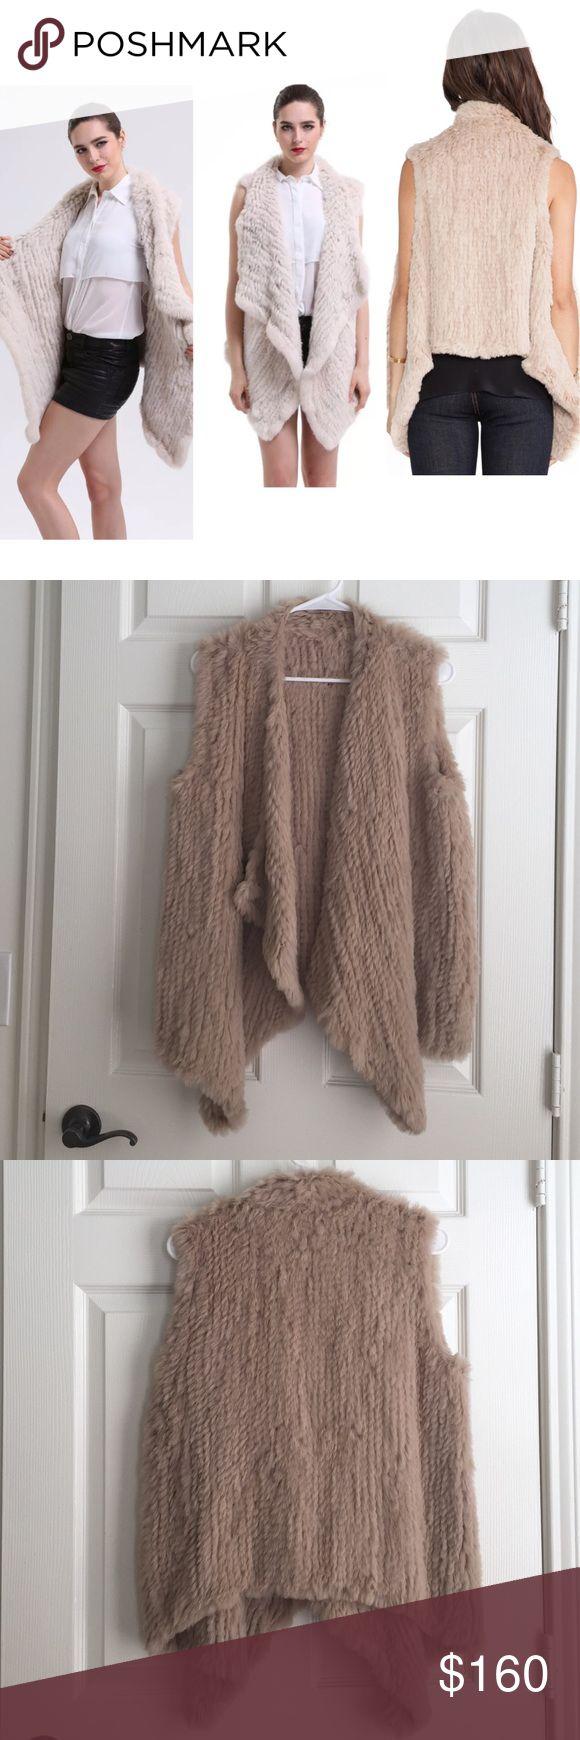 Rabbit fur vest in beige Worn once,super soft,❌NO TRADE‼️ handmade Jackets & Coats Vests